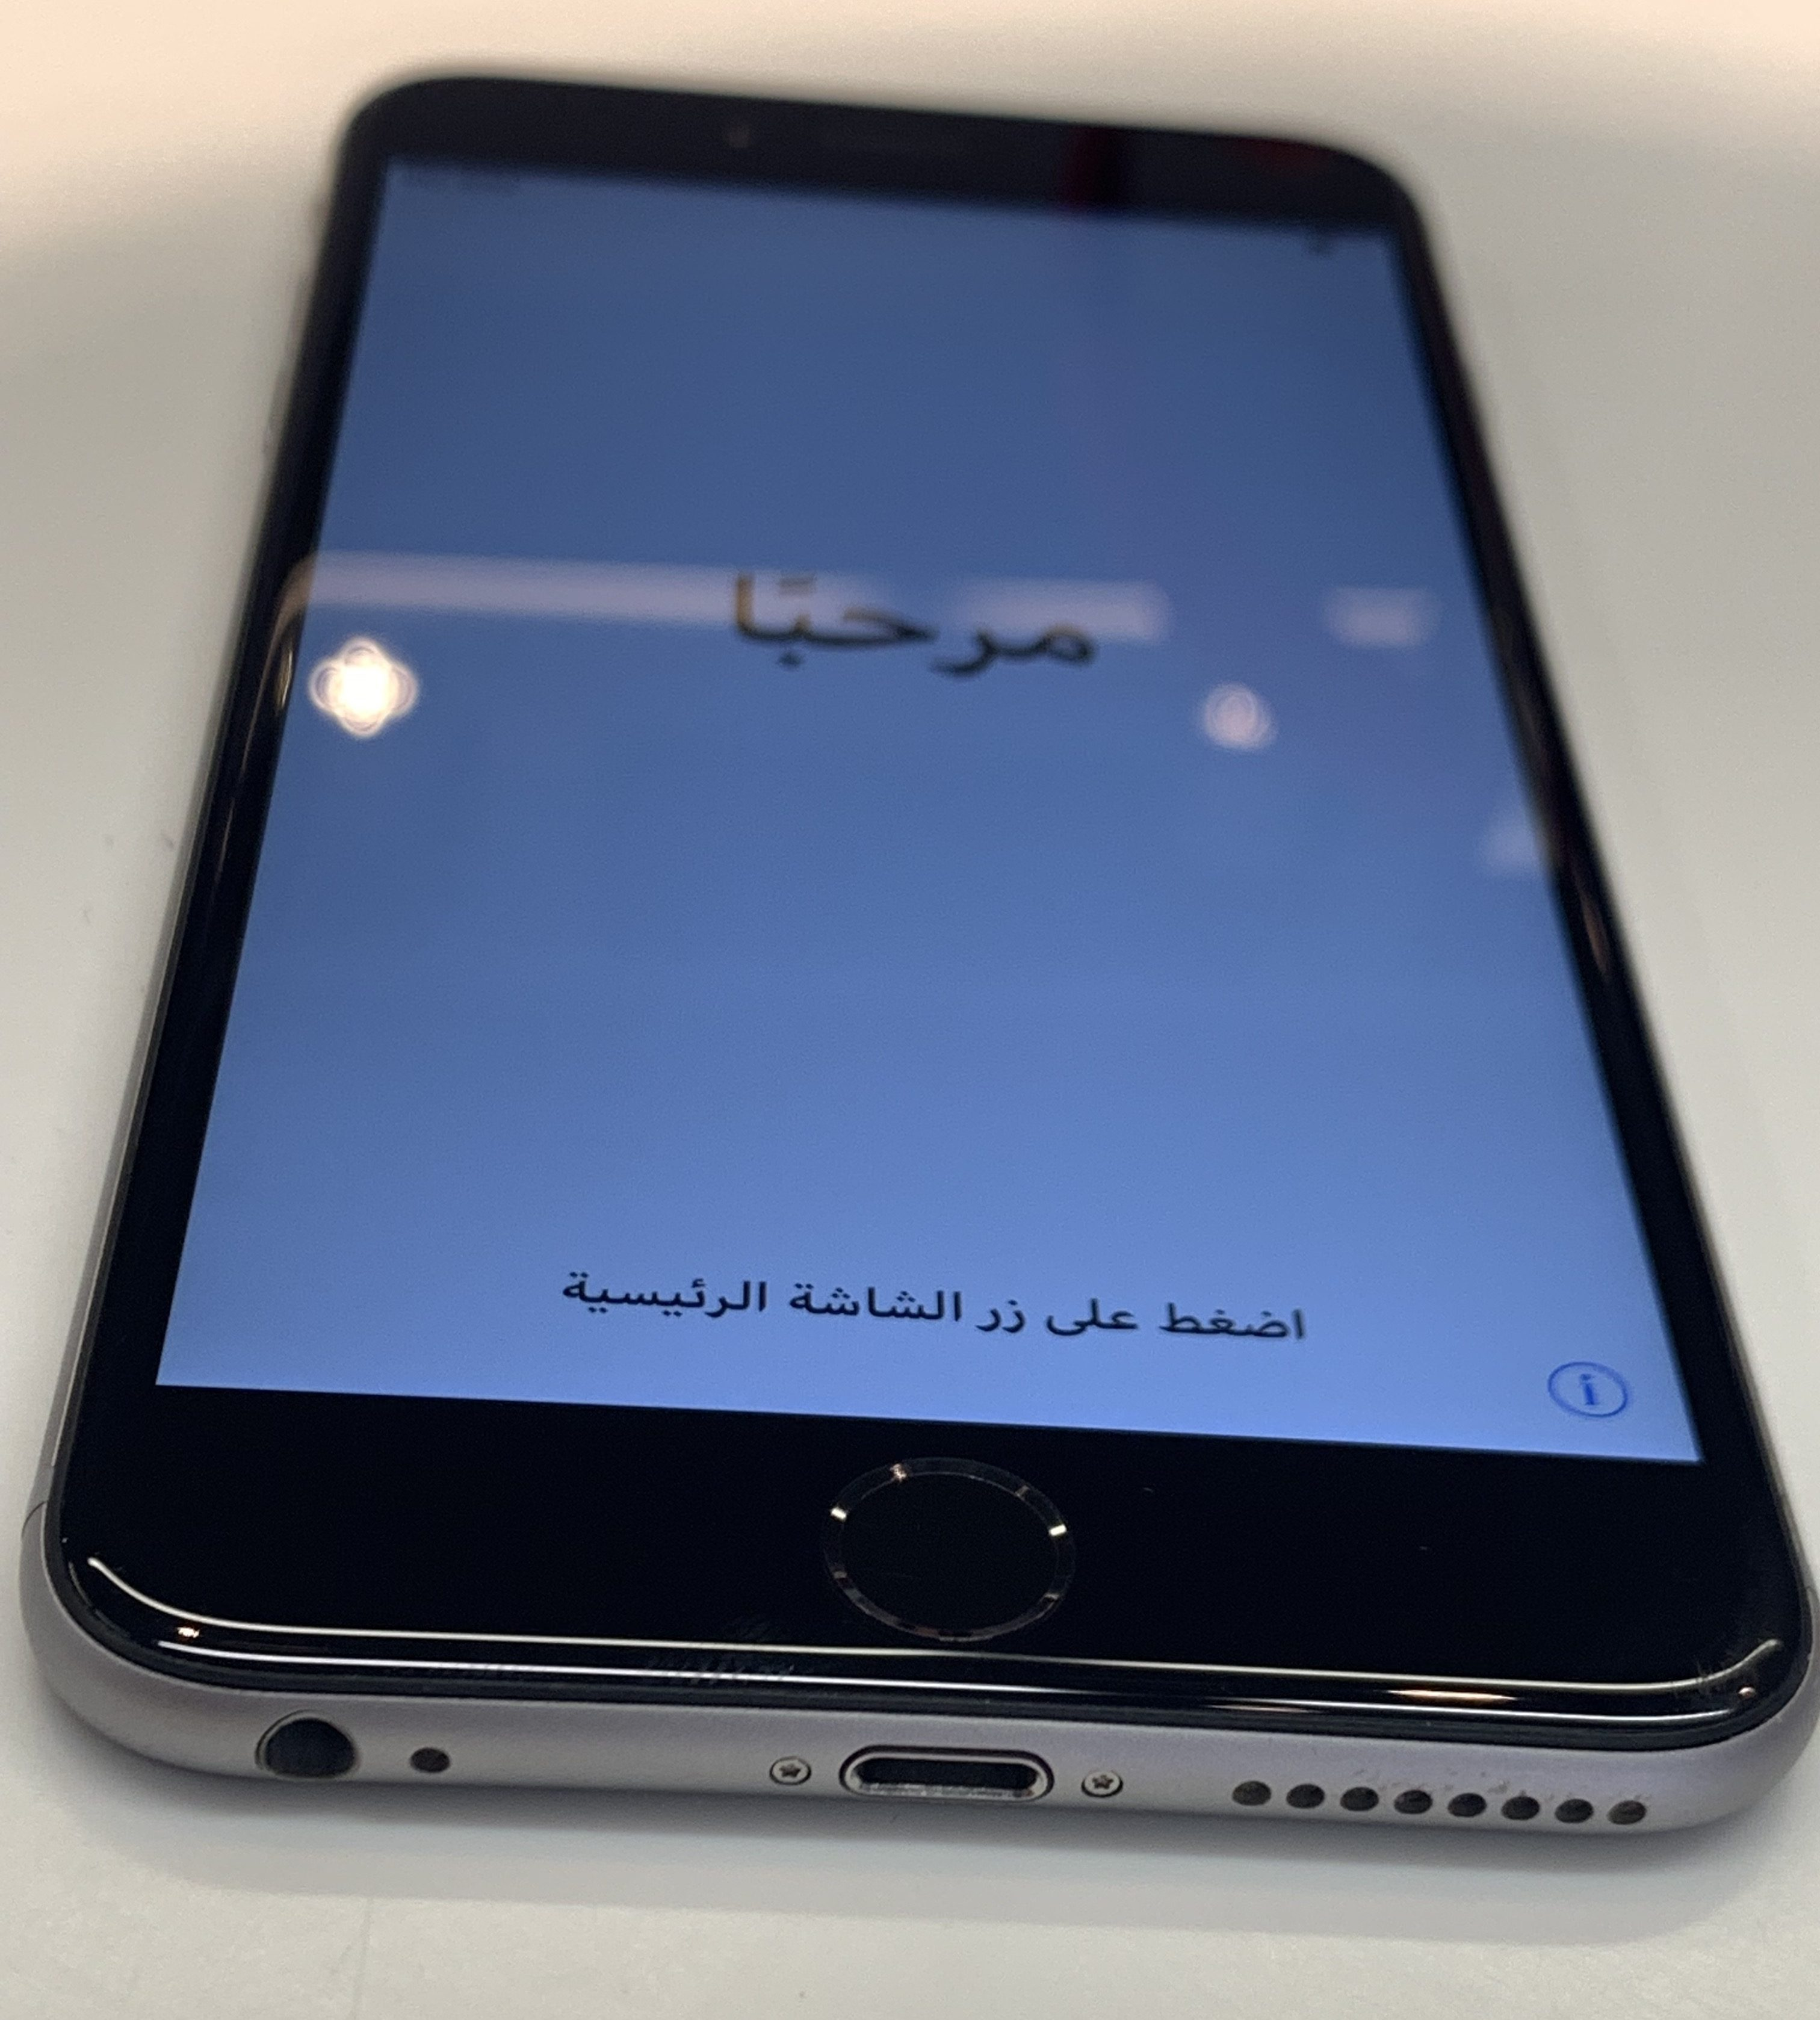 iPhone 6 32GB, 32 GB, Space Gray, obraz 3